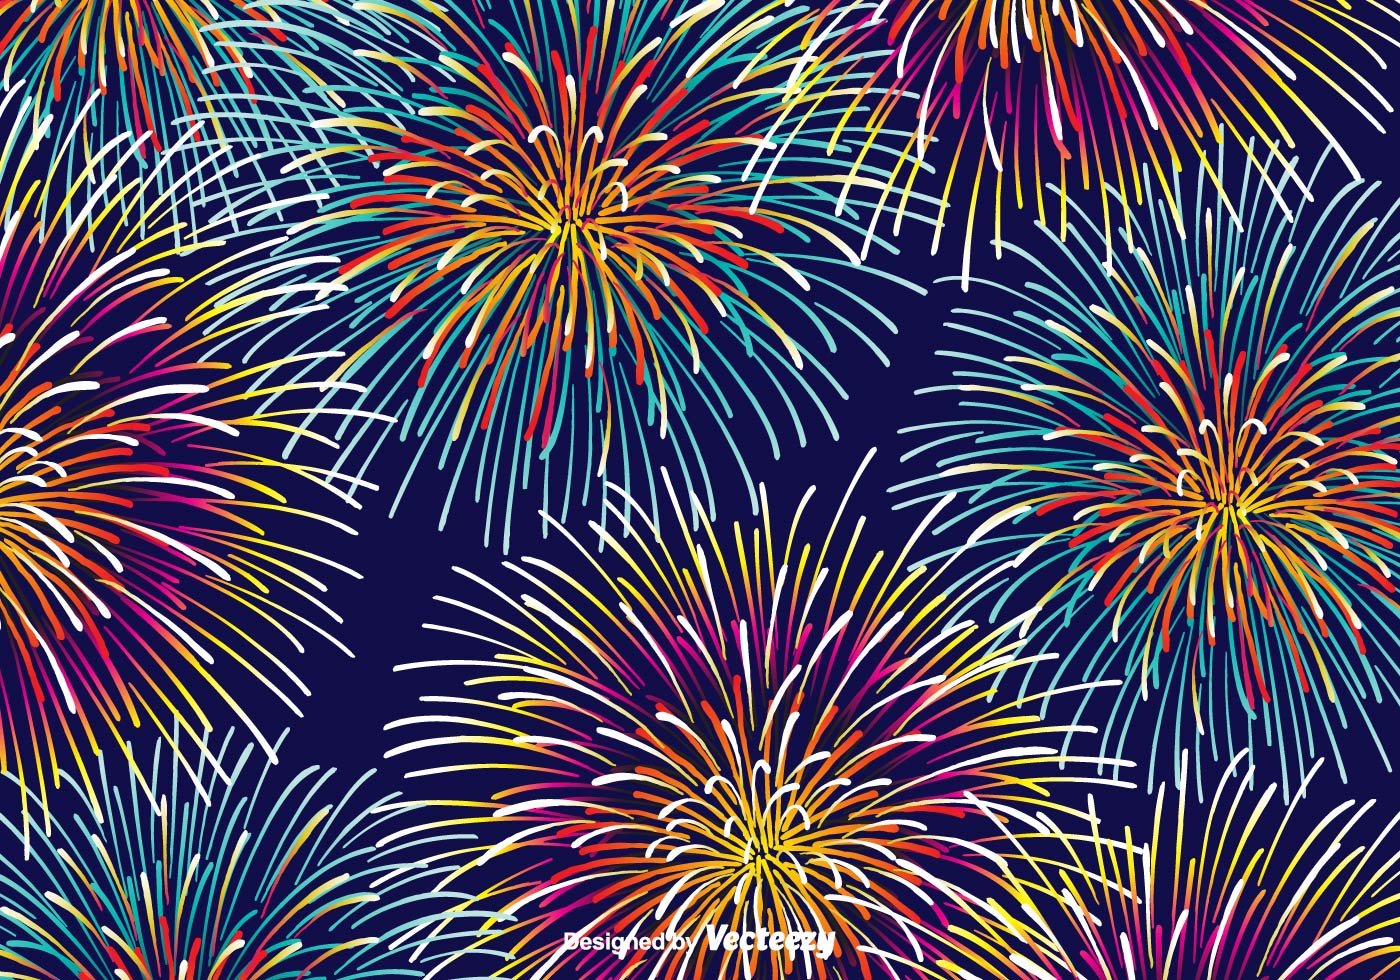 Fireworks Wallpaper Free: Colorful Fireworks Vector Background